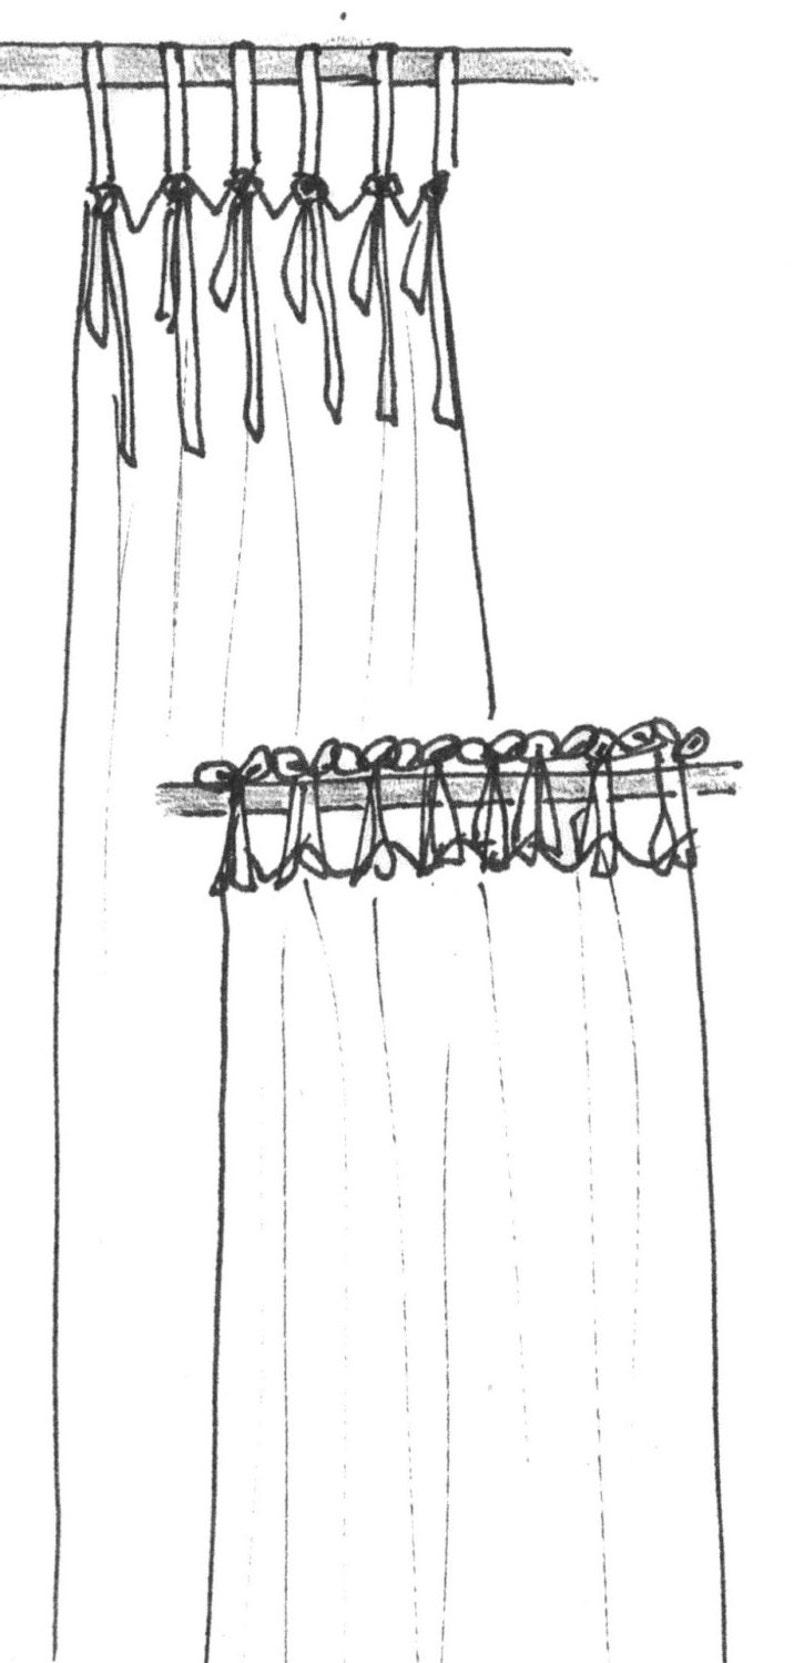 Tie Top Valance or Tie Top Drapery Panel